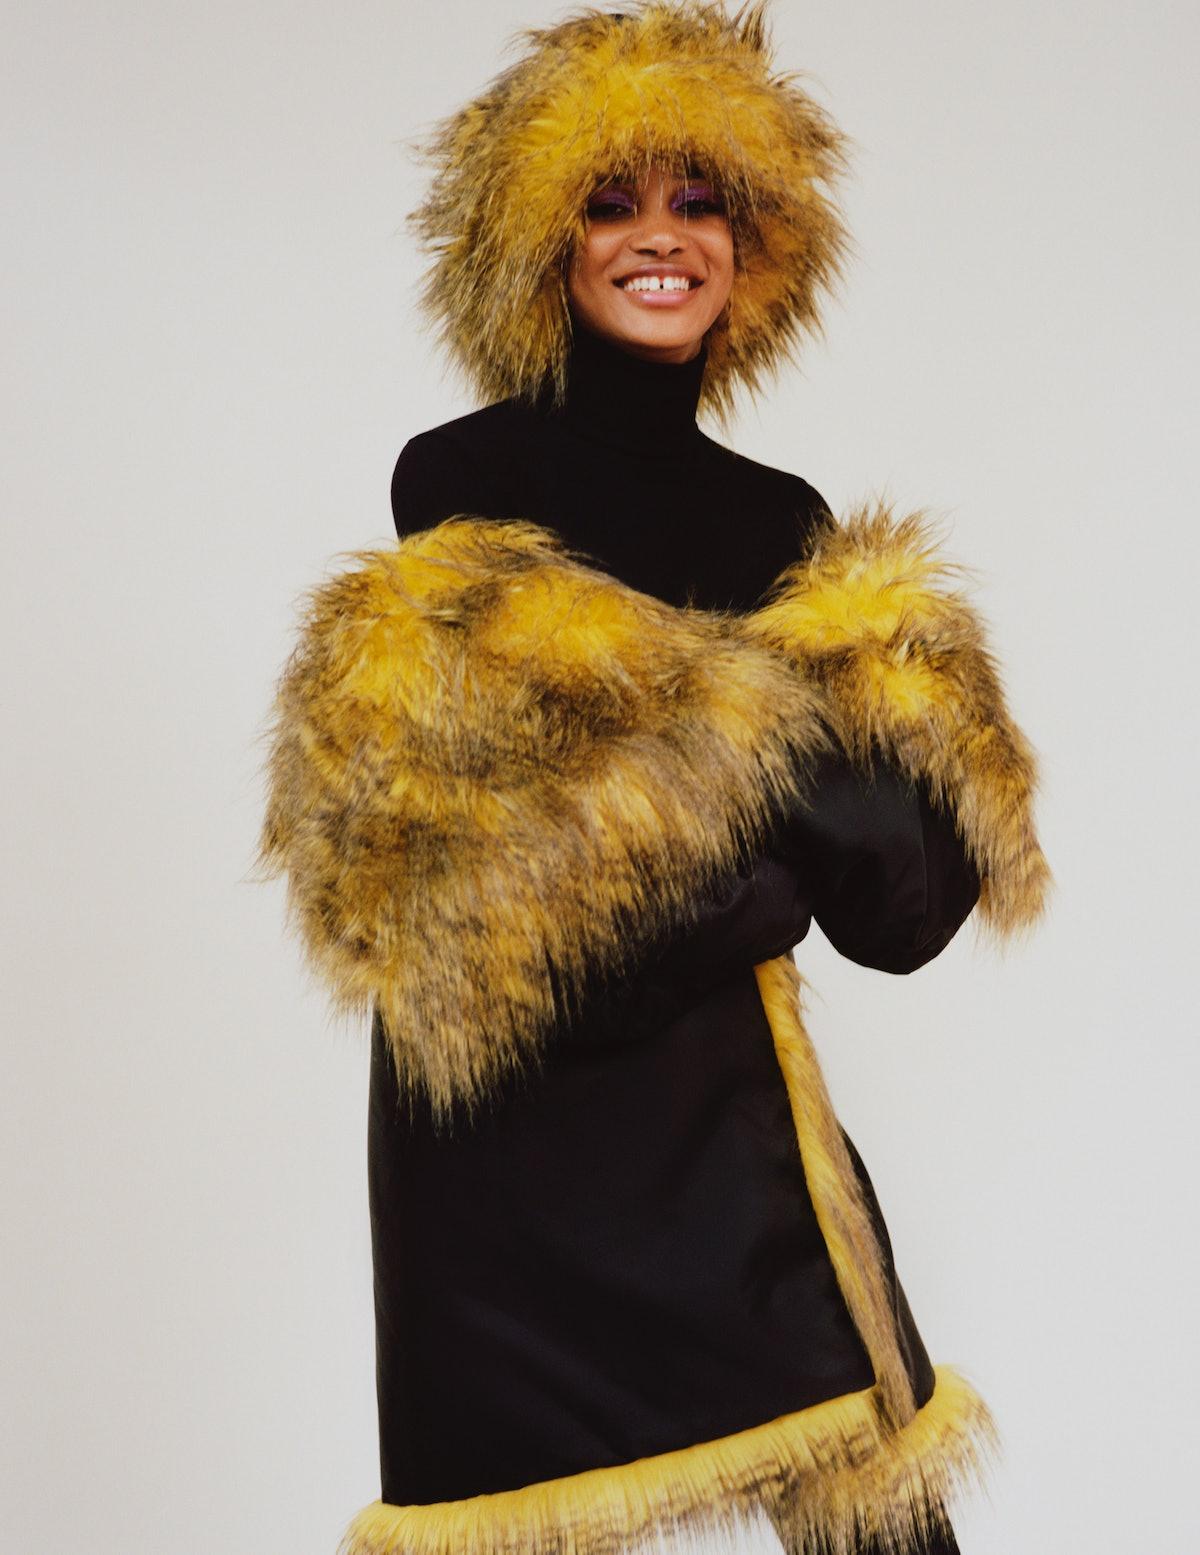 Amandine Guihard wears a Prada jacket with detachable hood (worn as hat), long johns, and boots.